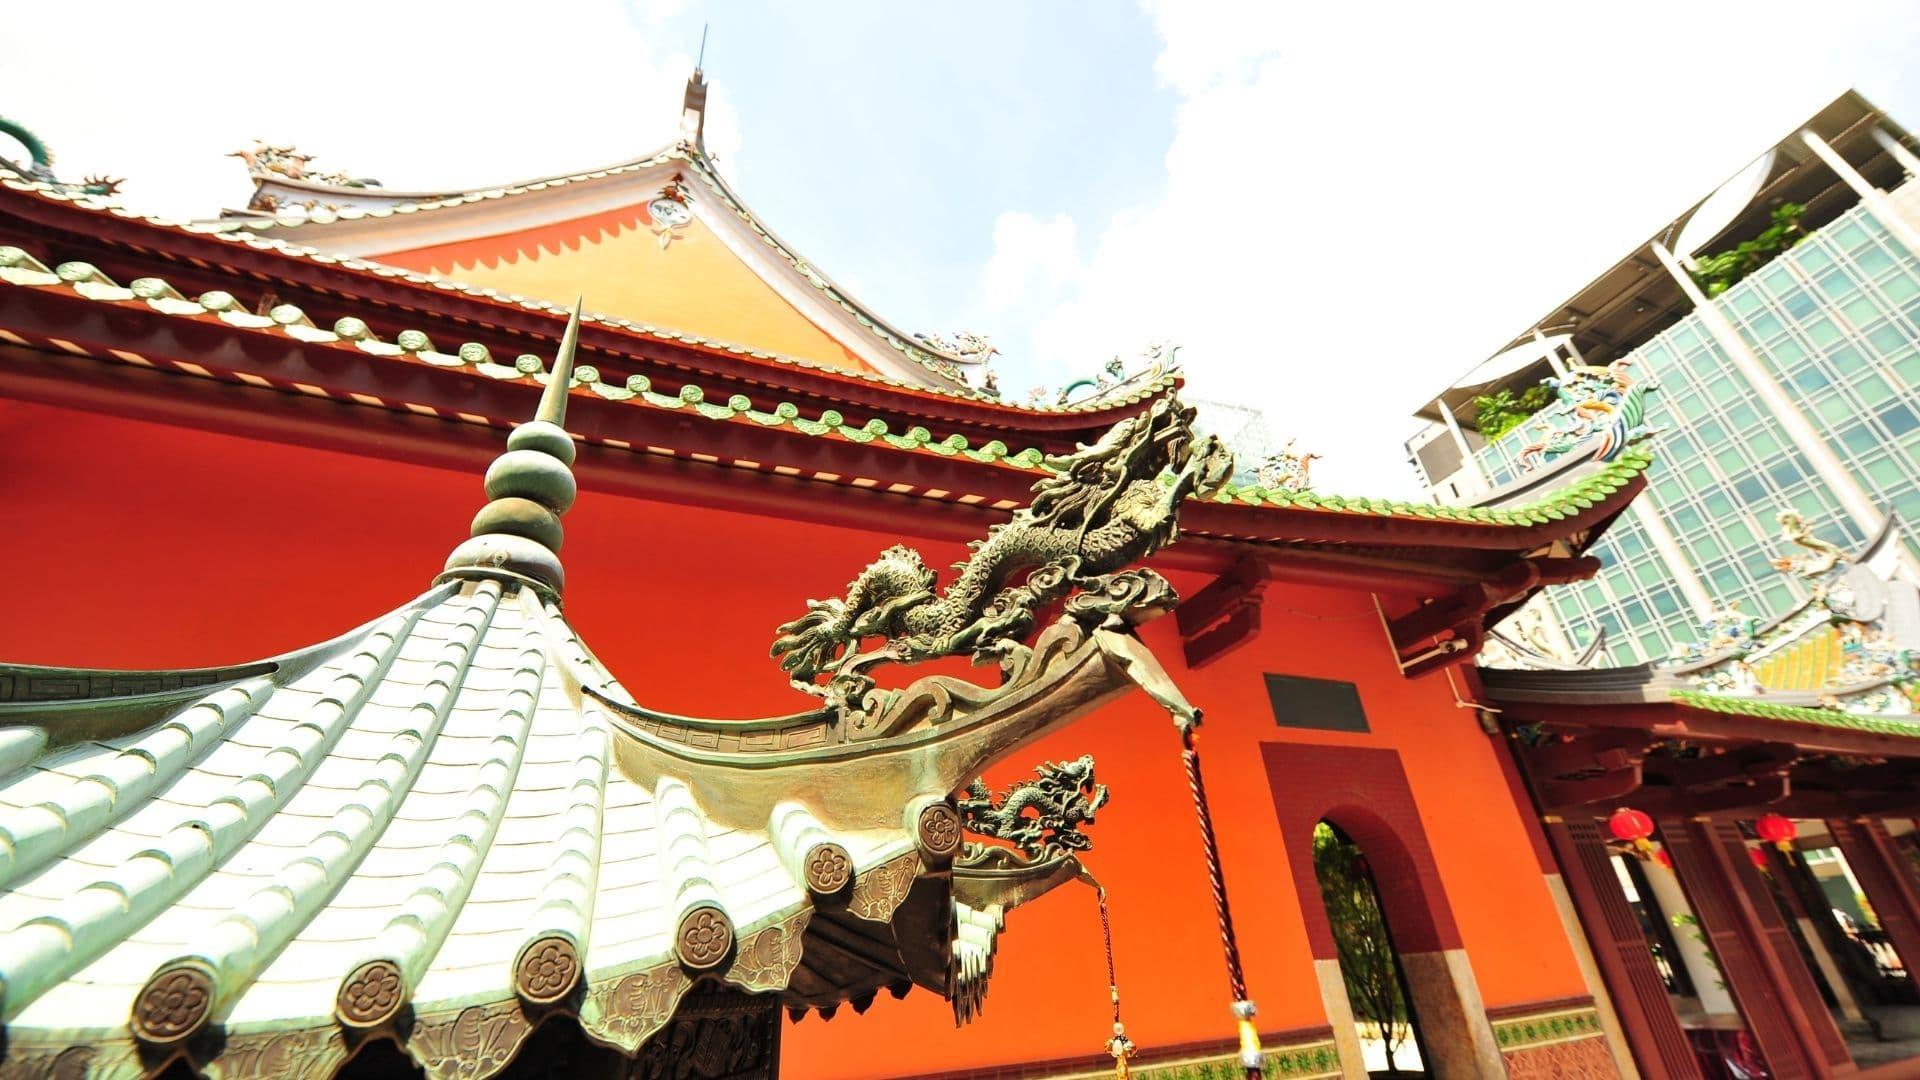 Fachada del Templo Thian Hock Keng